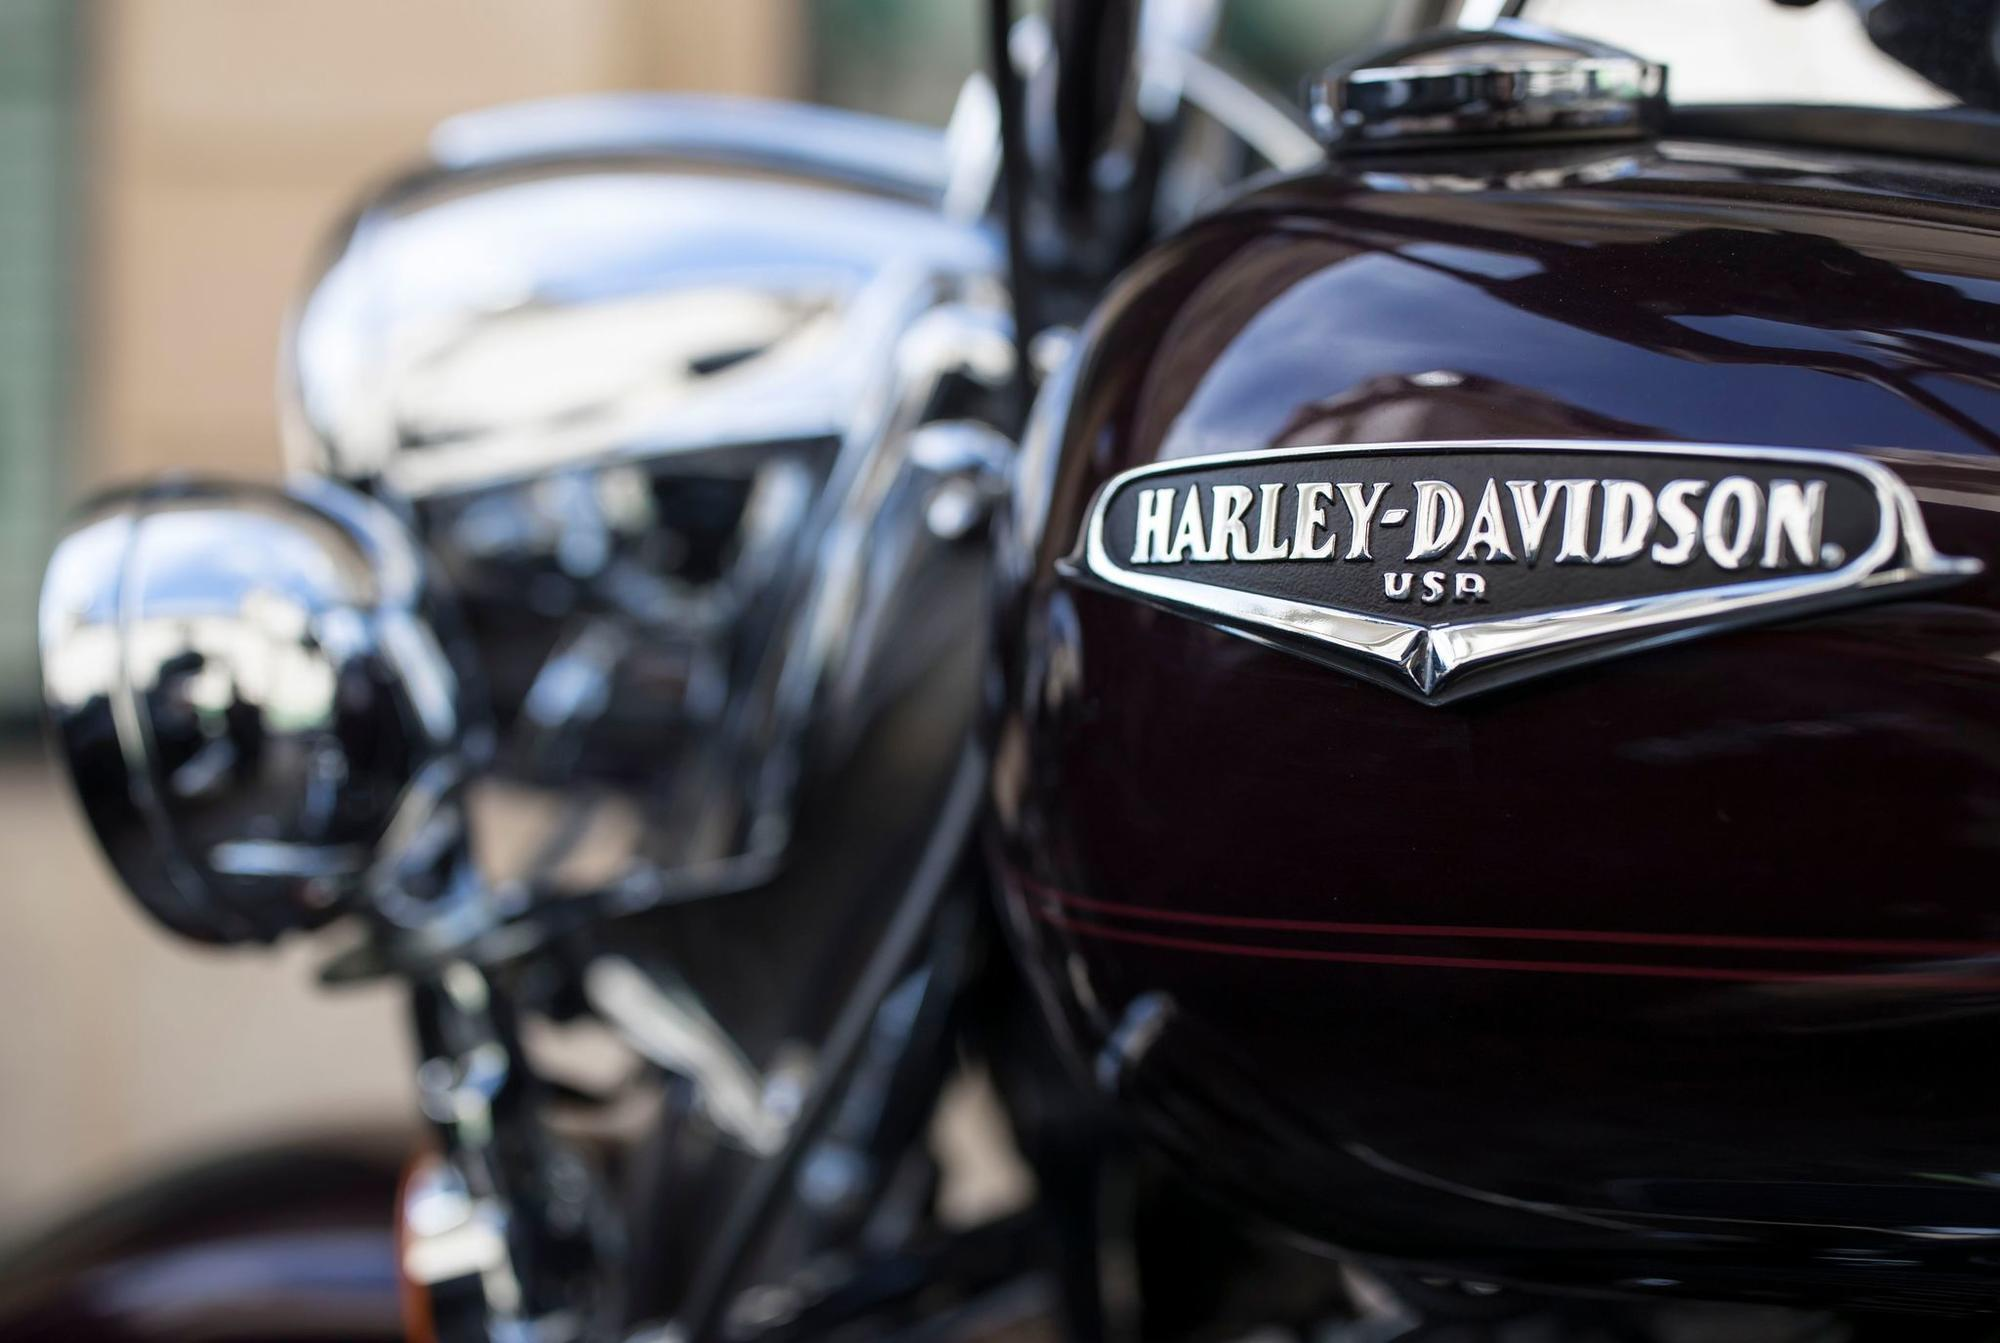 Harley Davidson: Trump Accuses Harley-Davidson Of Waving 'white Flag' For